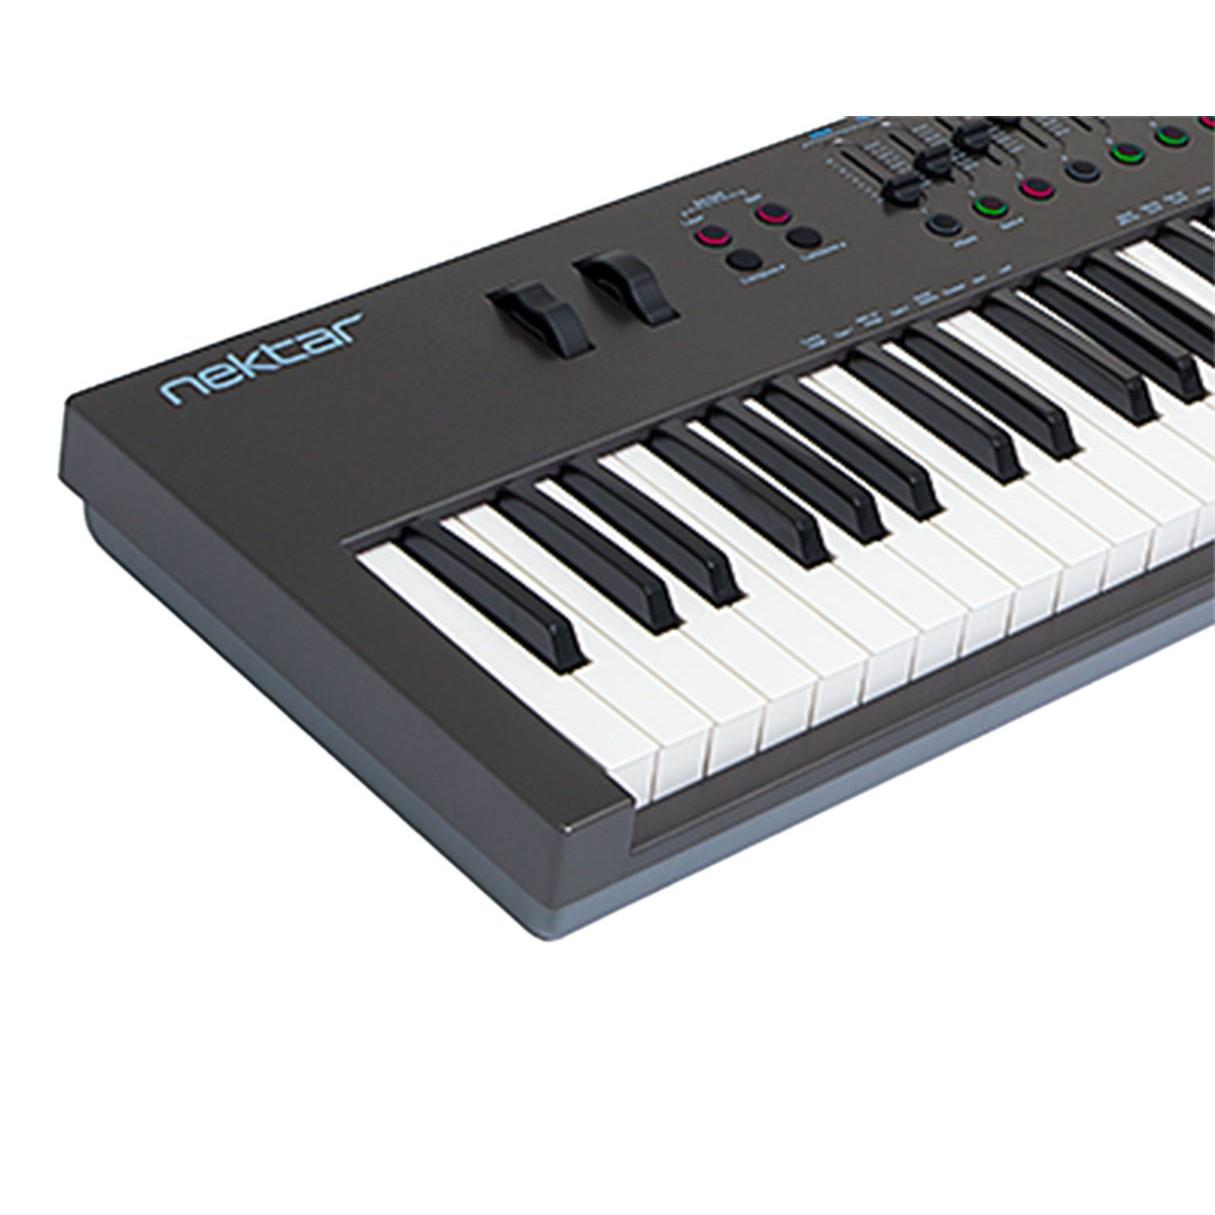 nektar impact lx88 88 key keyboard midi controller. Black Bedroom Furniture Sets. Home Design Ideas